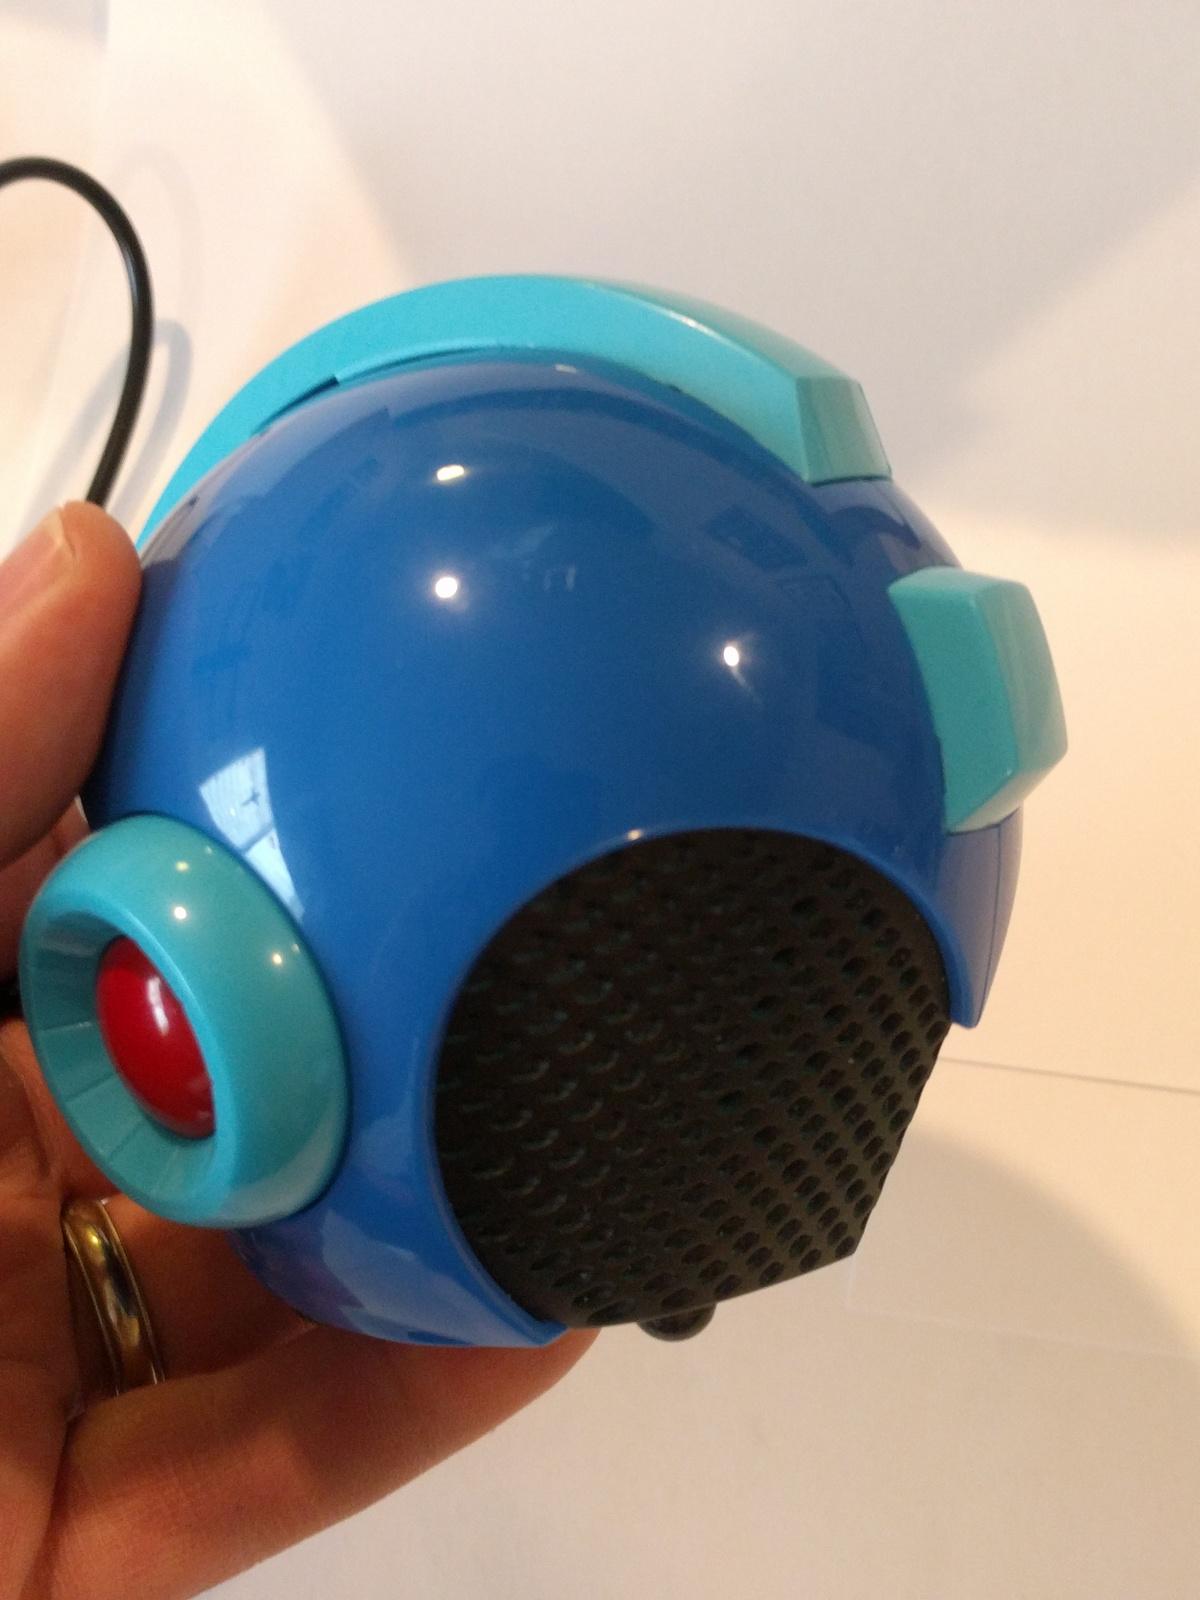 MegaMan Helmet gaming system w/ Raspberry Pi ZeroW installed. Modded Megaman Hel